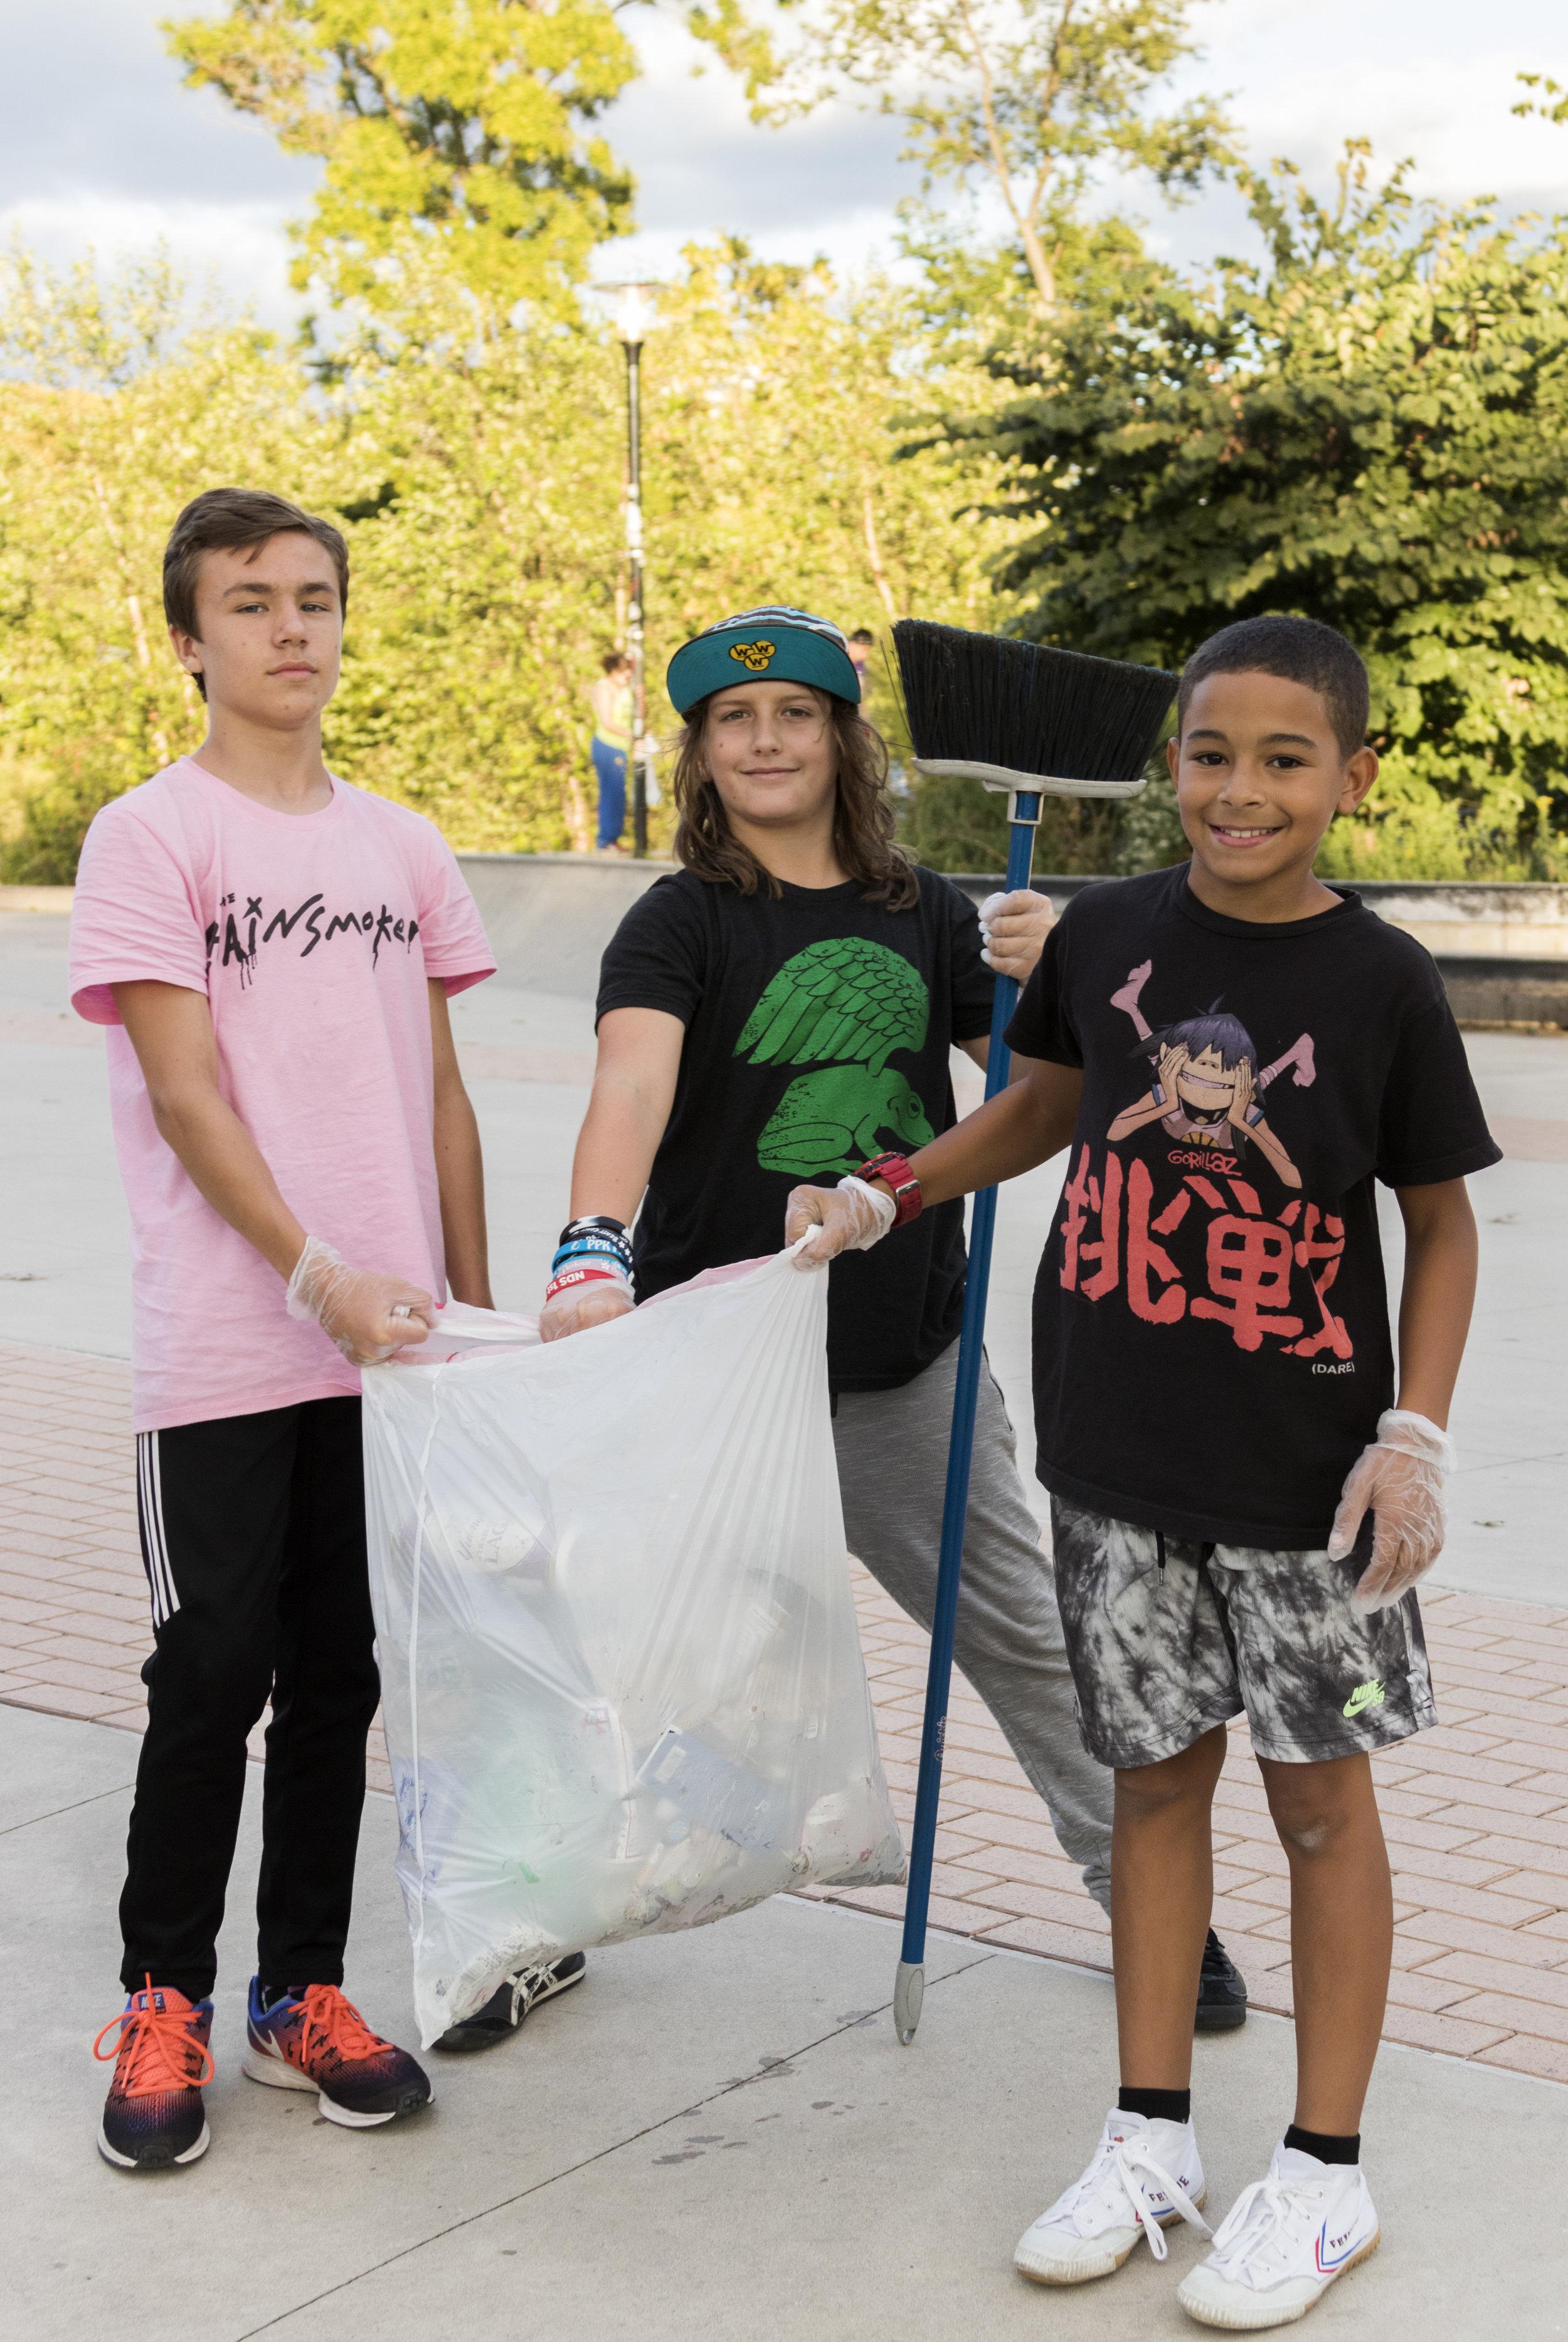 The Intrepid Trash Trio